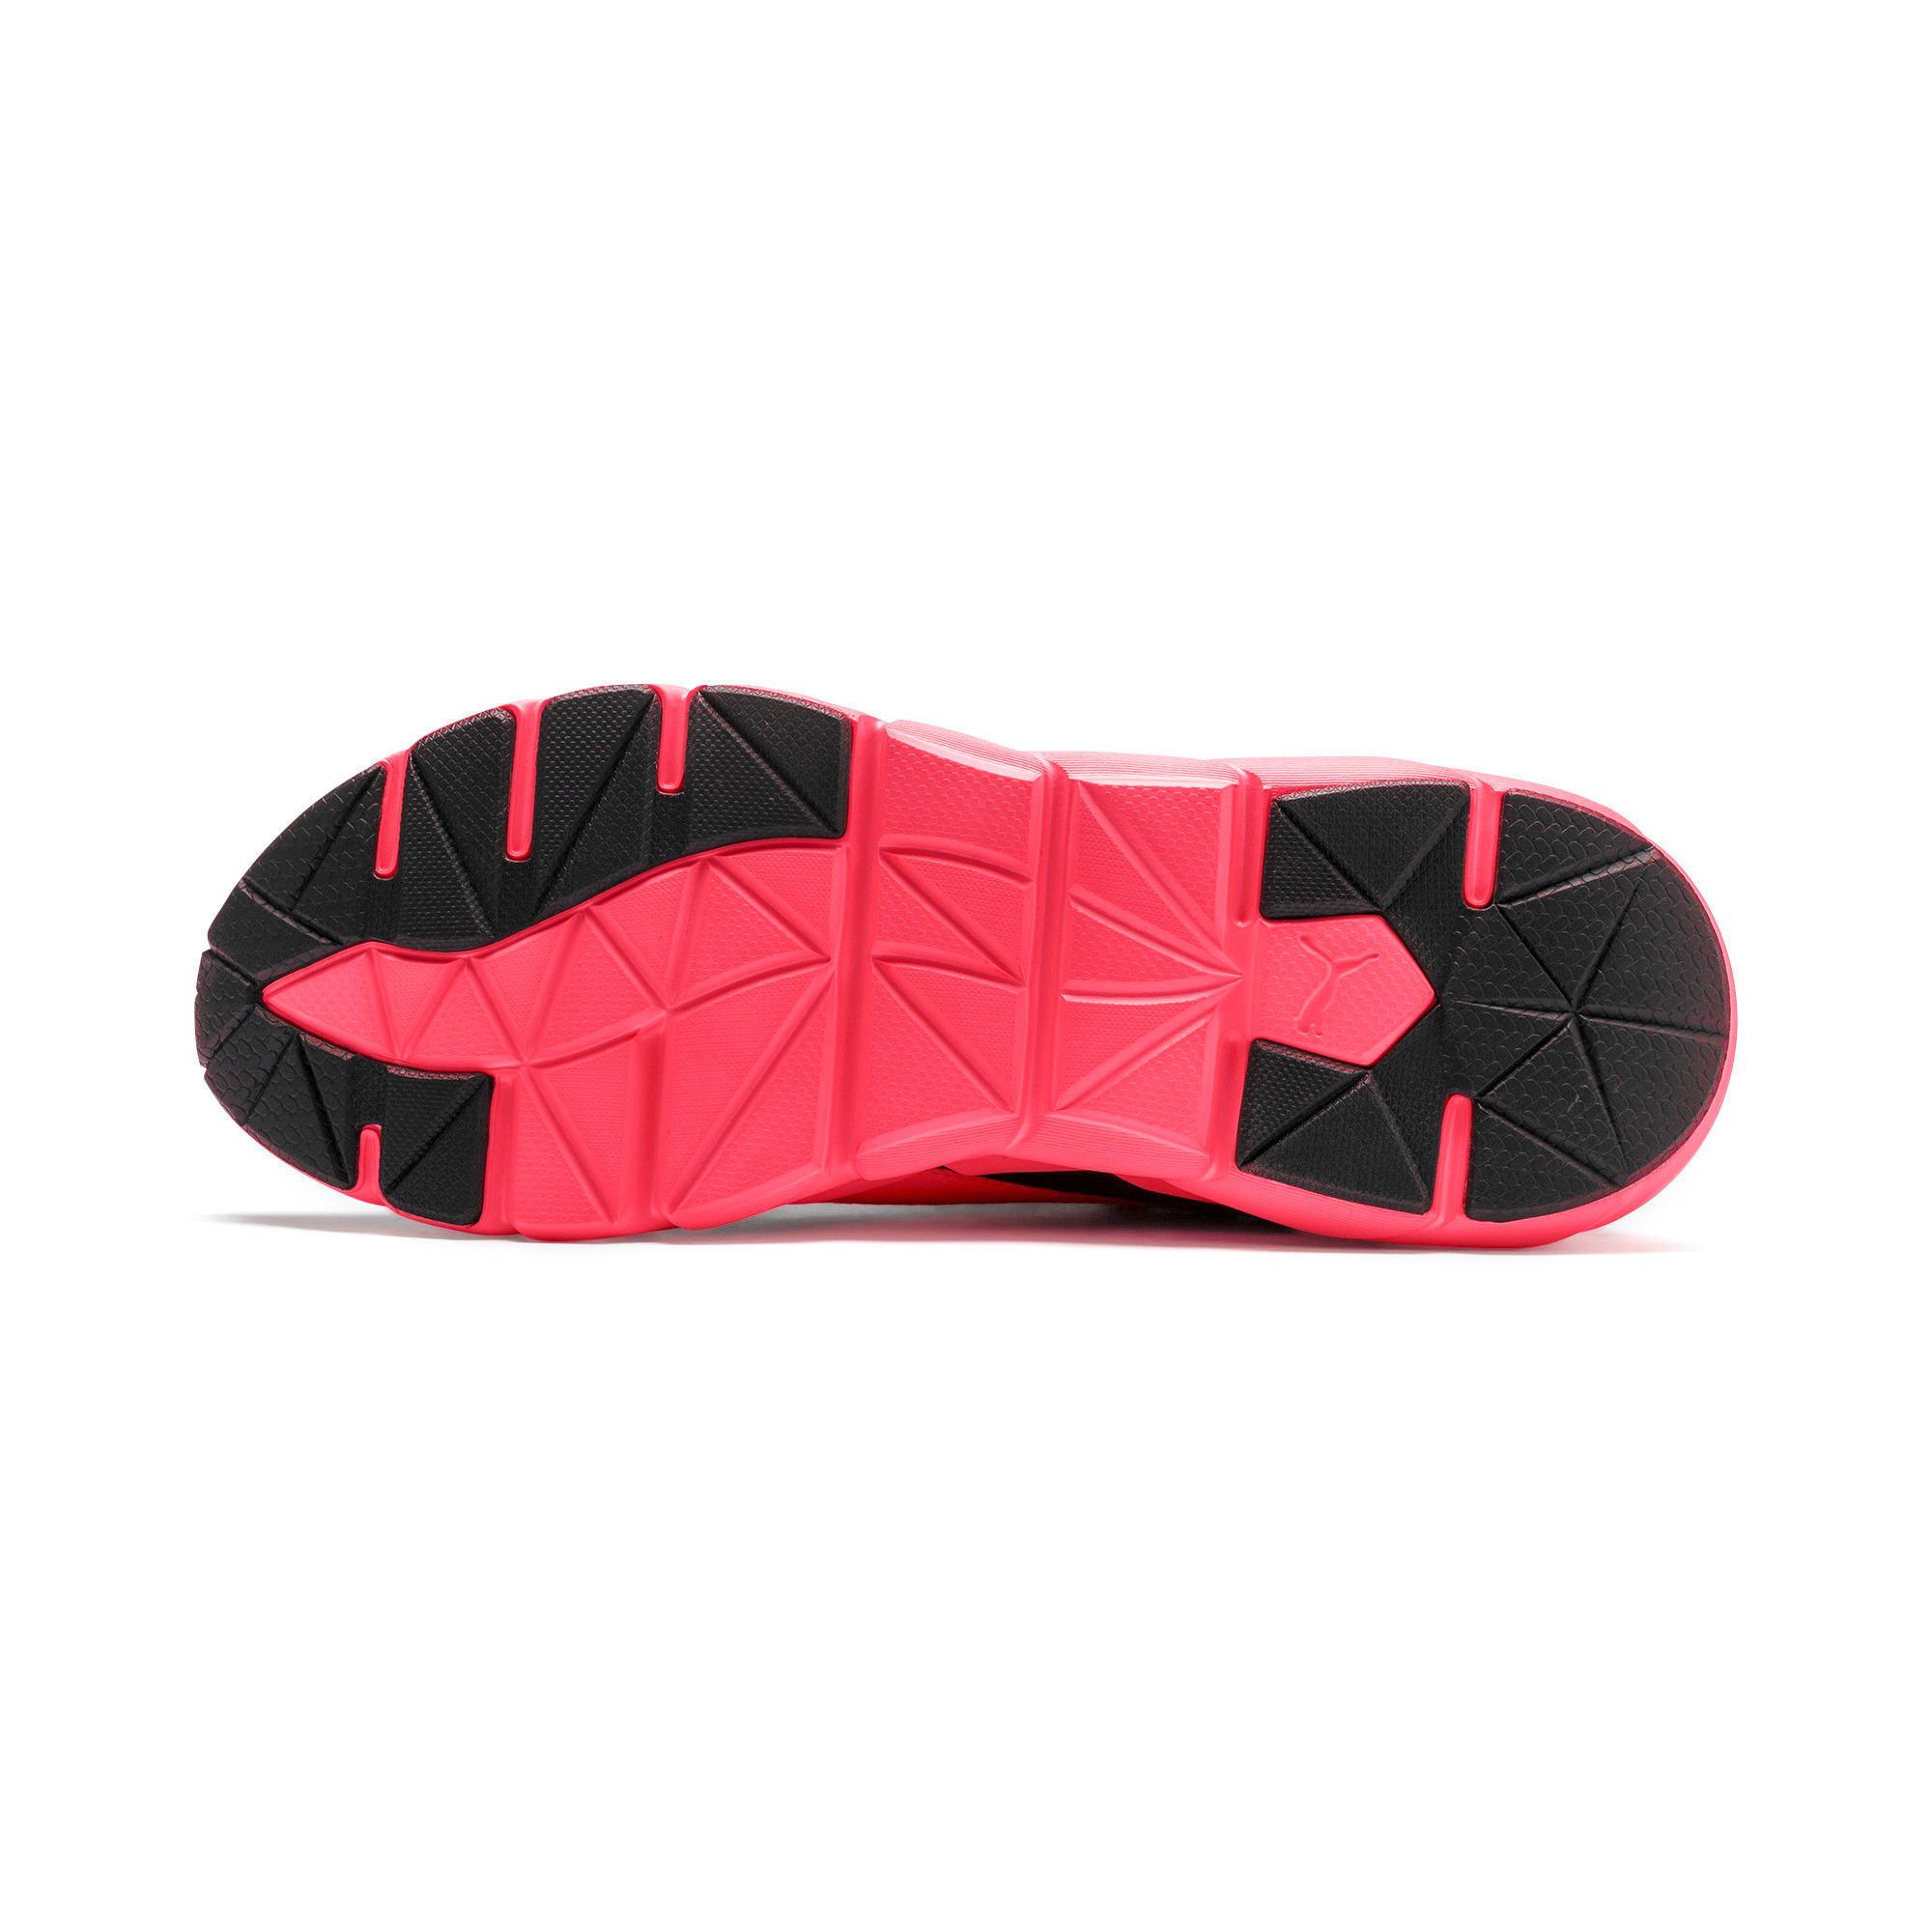 Thumbnail 5 of Weave XT Women's Training Shoes, Puma Black-Pink Alert, medium